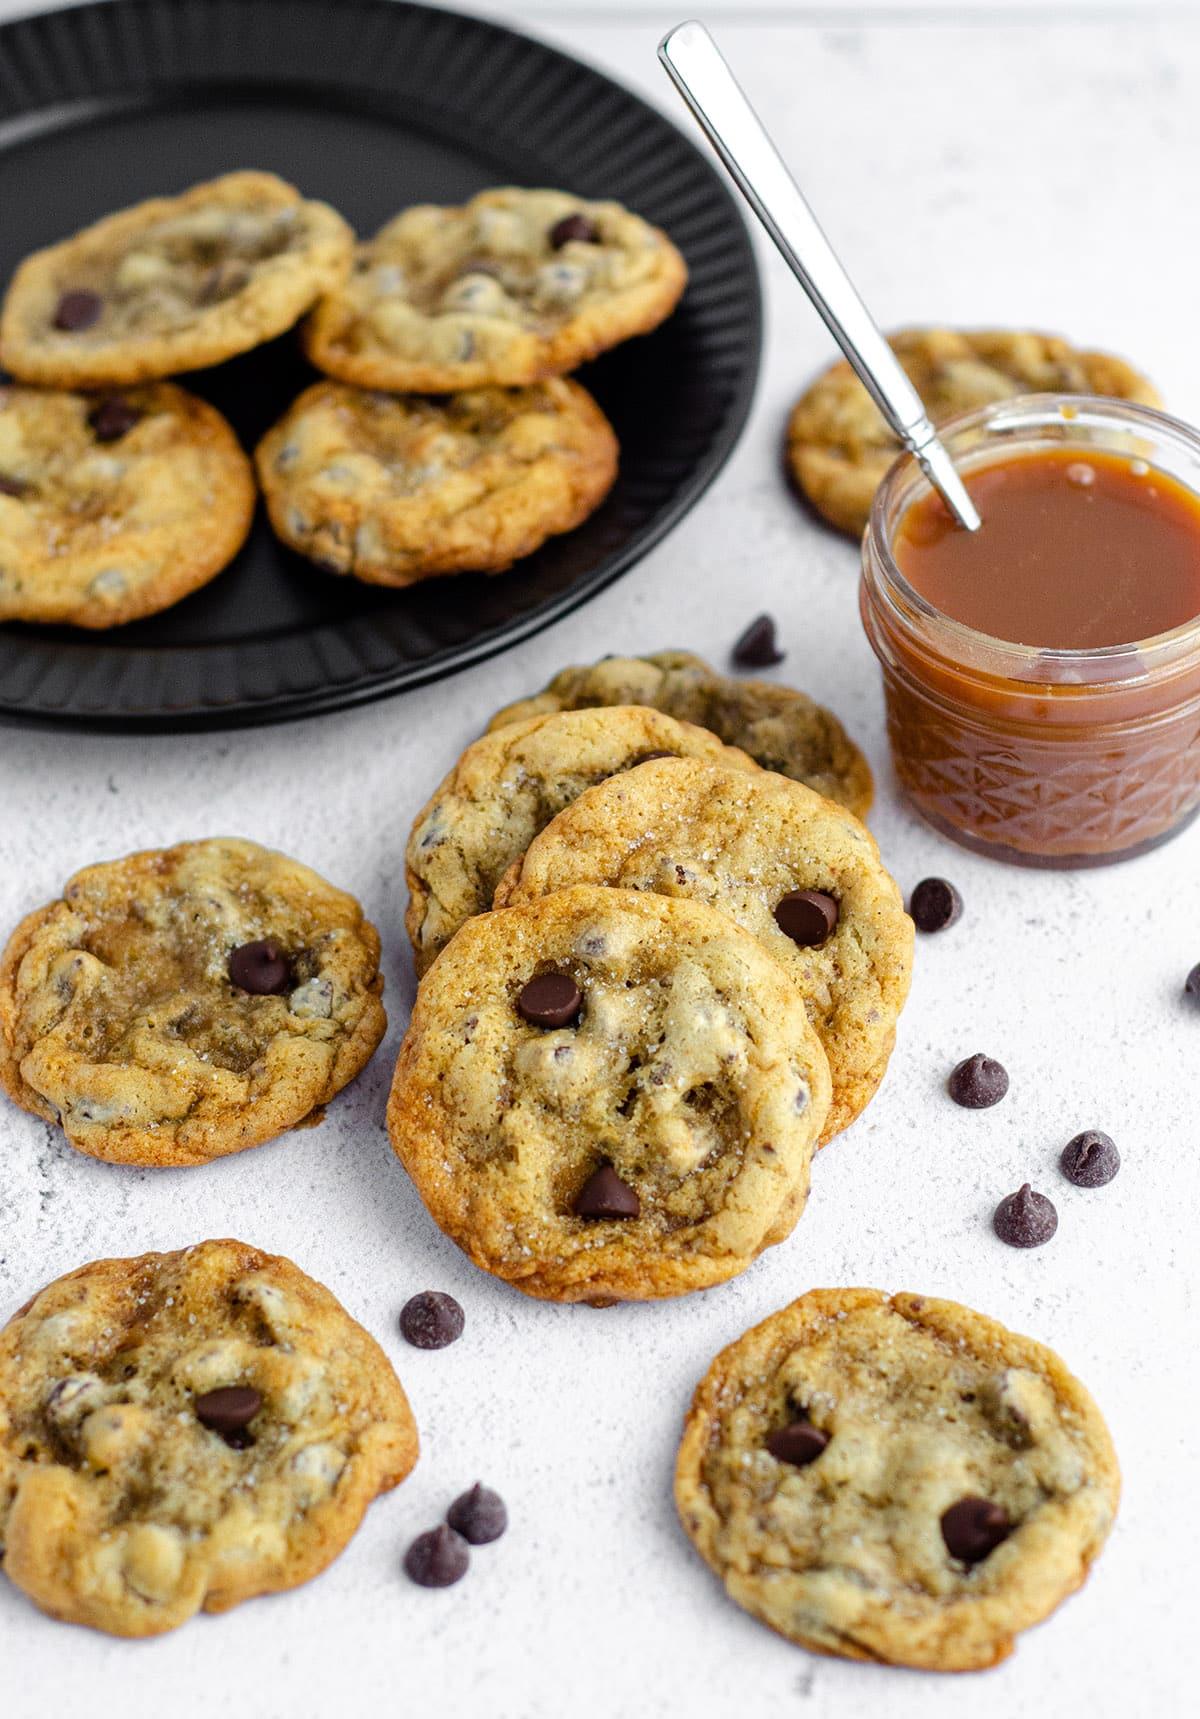 salted caramel chocolate chip cookies with a jar of salted caramel sauce